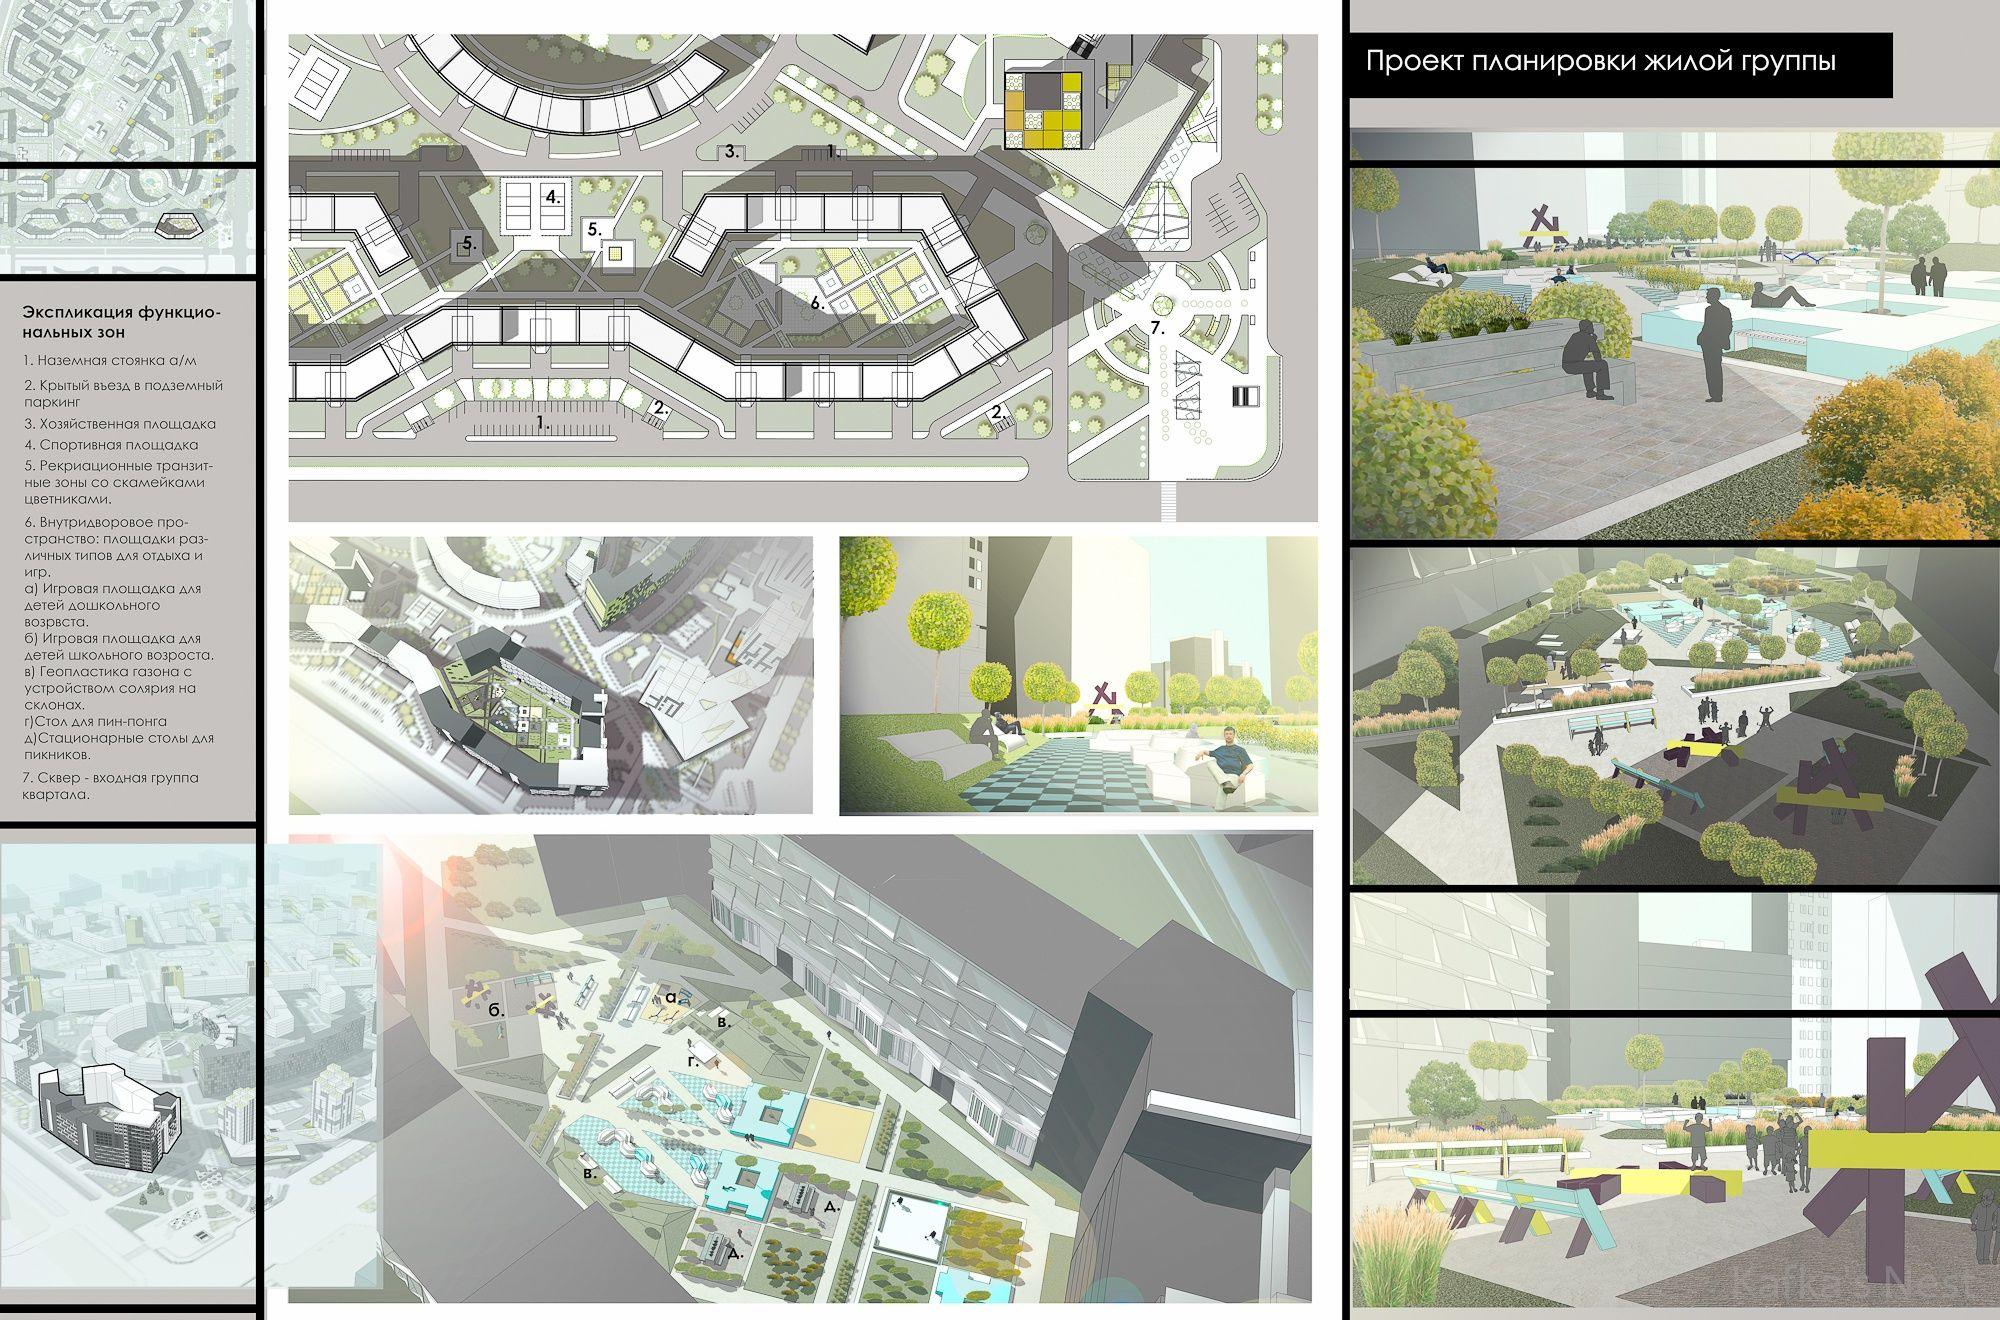 portfolio filin olga starting architect Дипломный проект